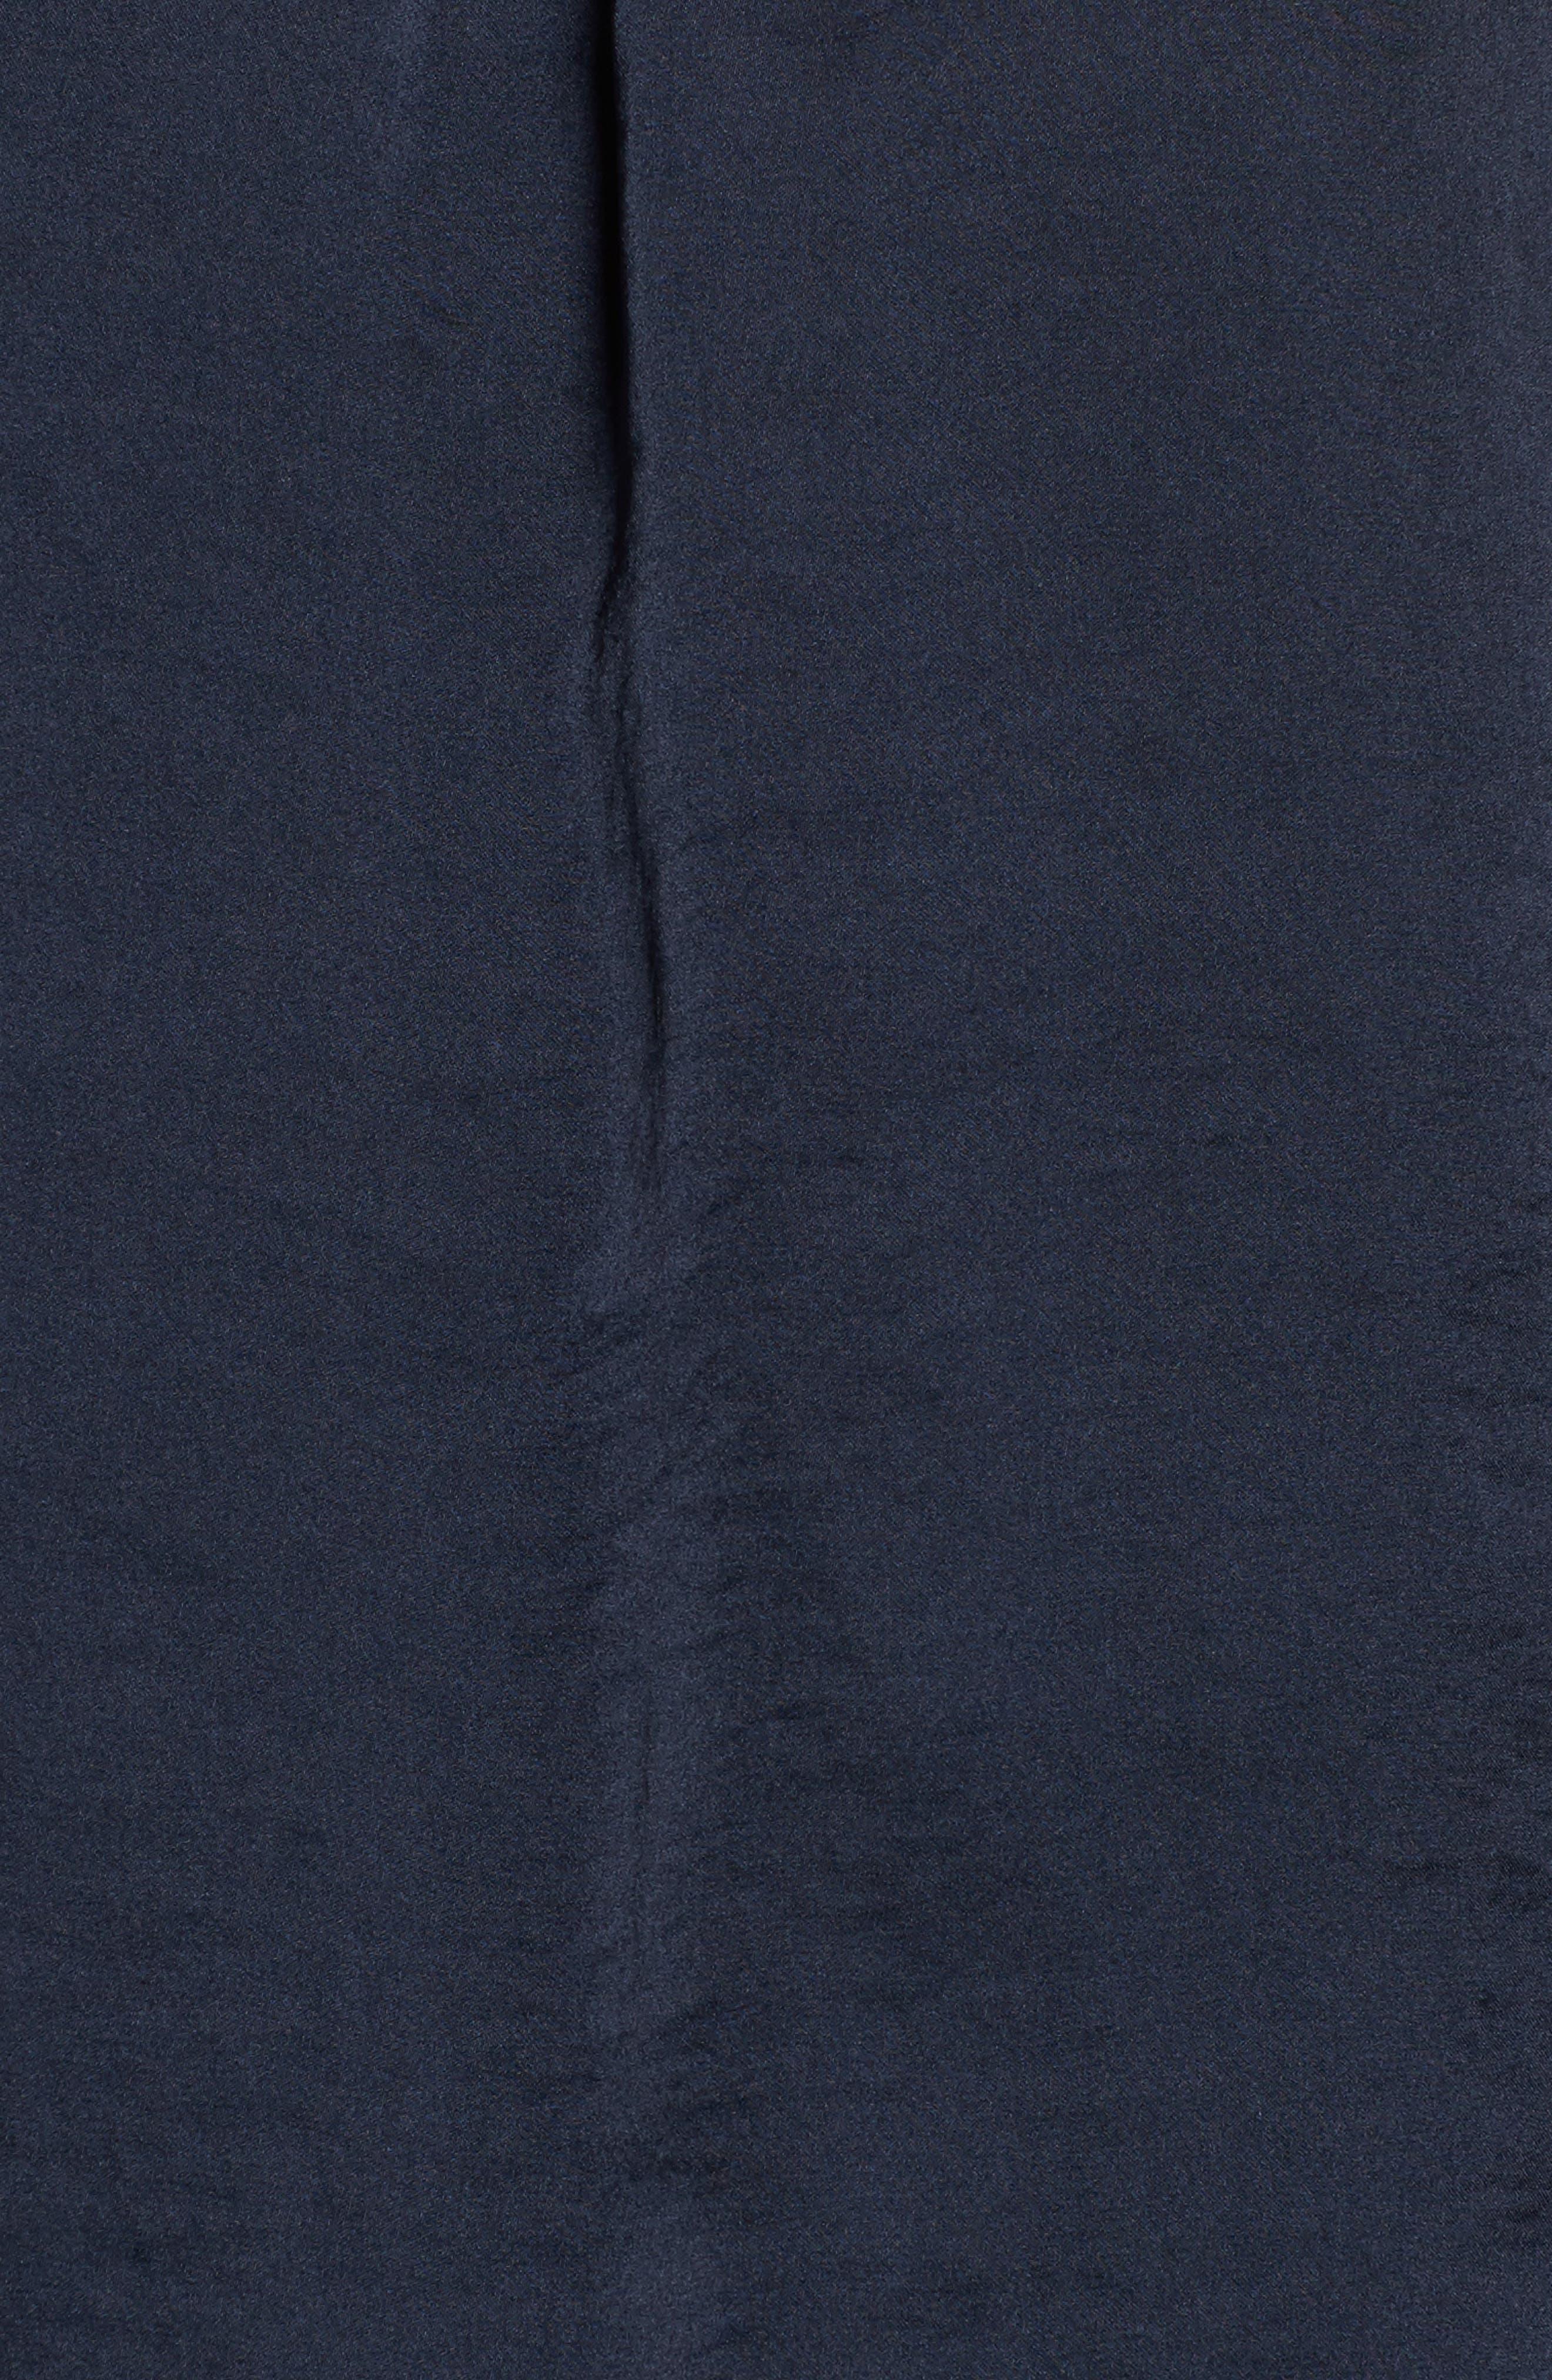 Bell Sleeve Hammered Satin Blouse,                             Alternate thumbnail 18, color,